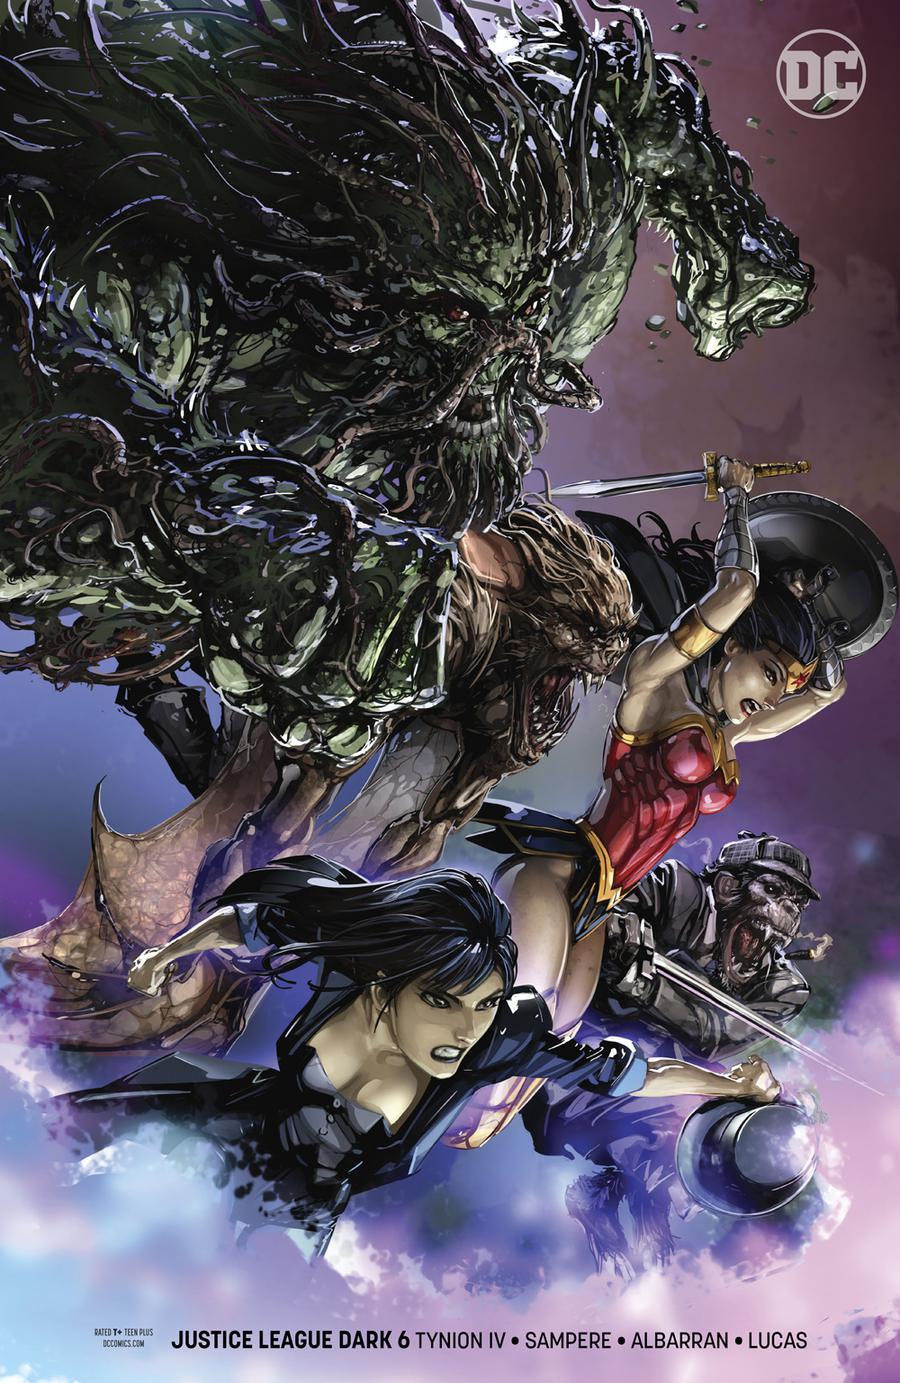 Justice League Dark Vol 2 #6 Cover B Variant Clayton Crain Cover